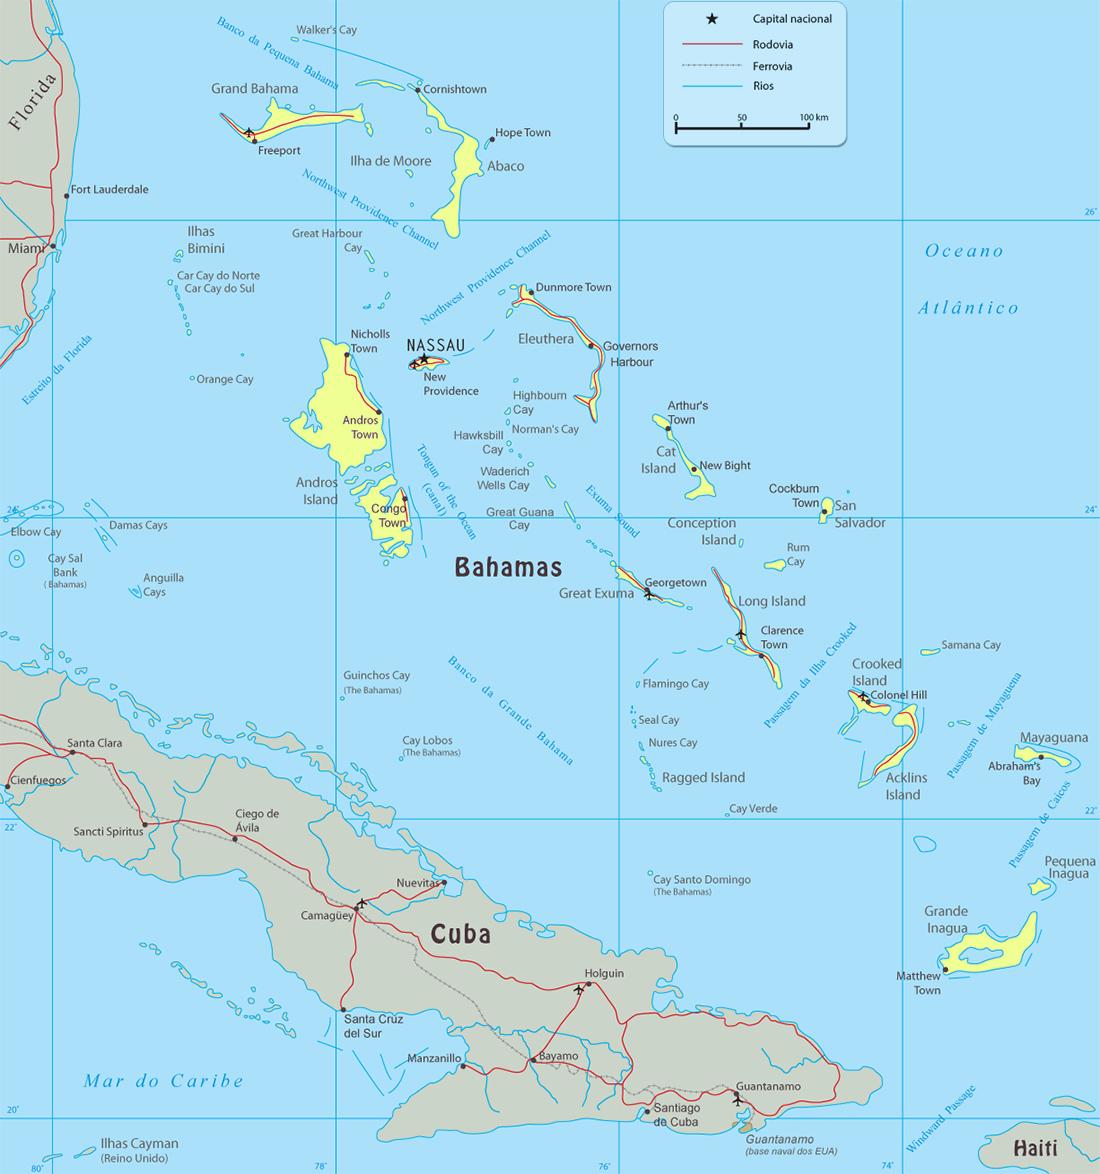 mapa-bahamas.jpg